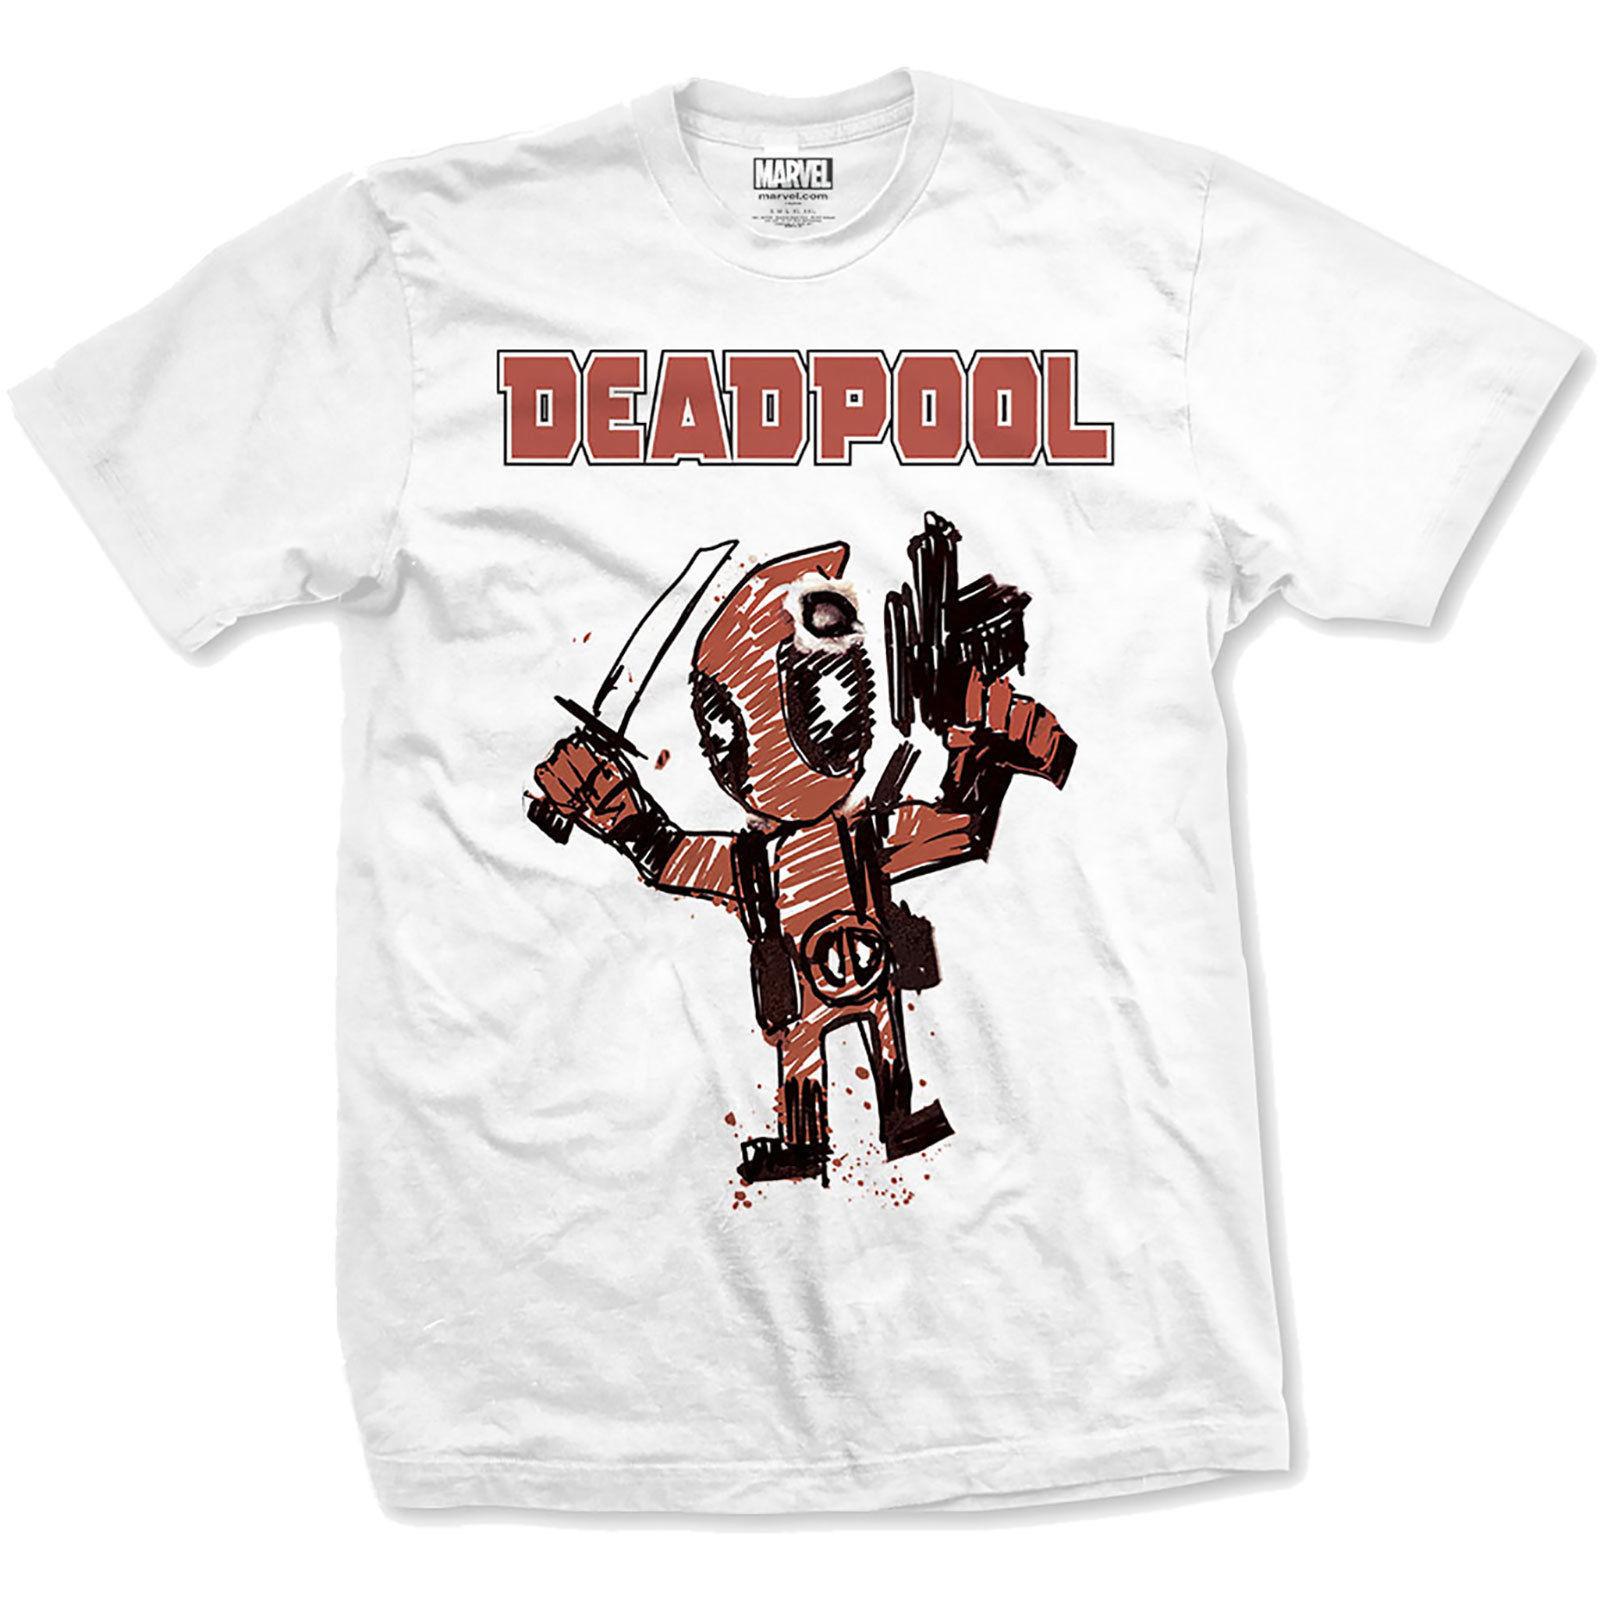 Deadpool Cartoon Bullet (XX Large) image